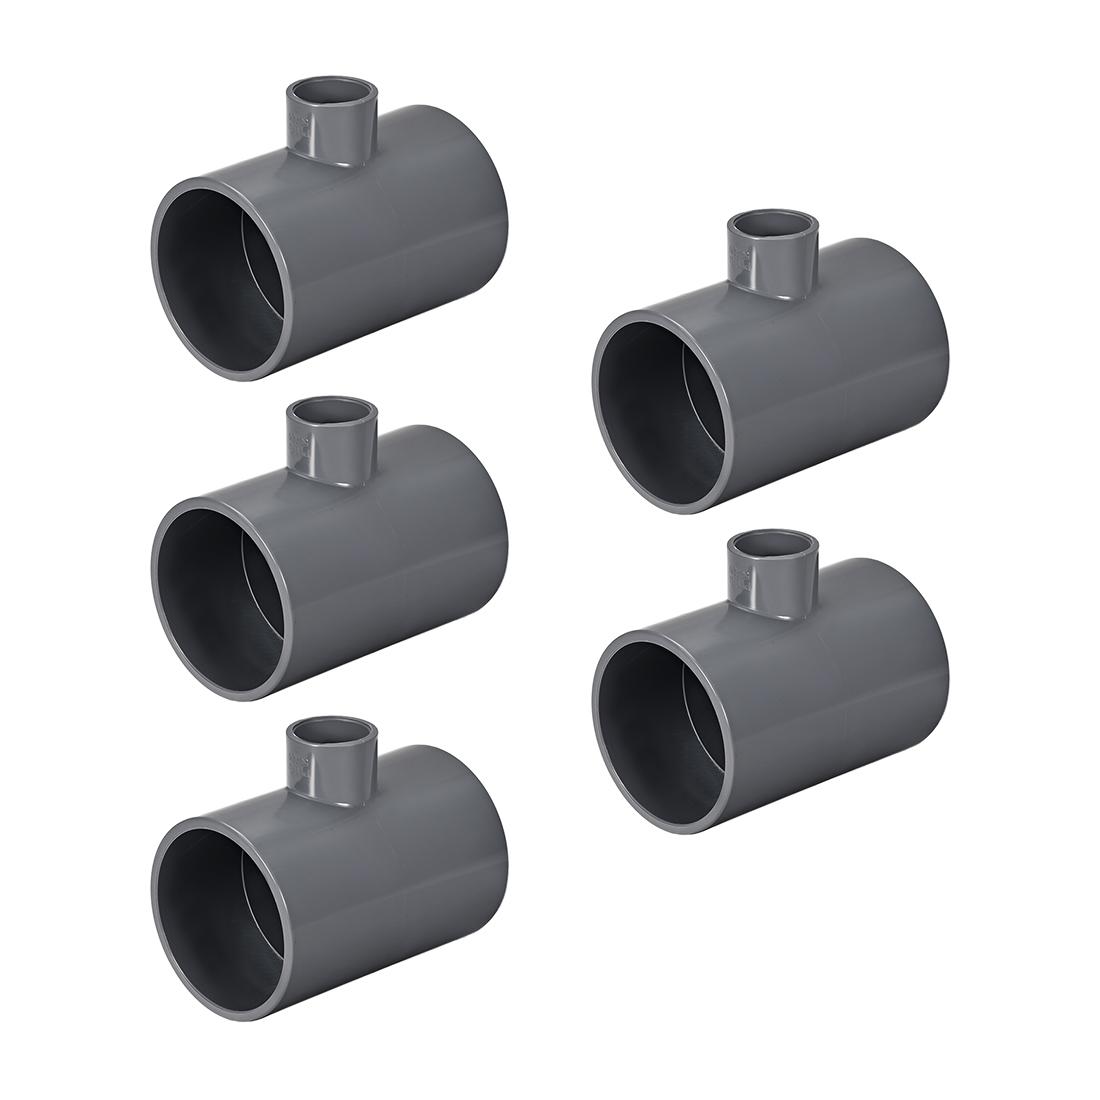 PVC Pipe Fitting Tee 401-Series Gray 3/4-inch X 2-inch Socket 5pcs